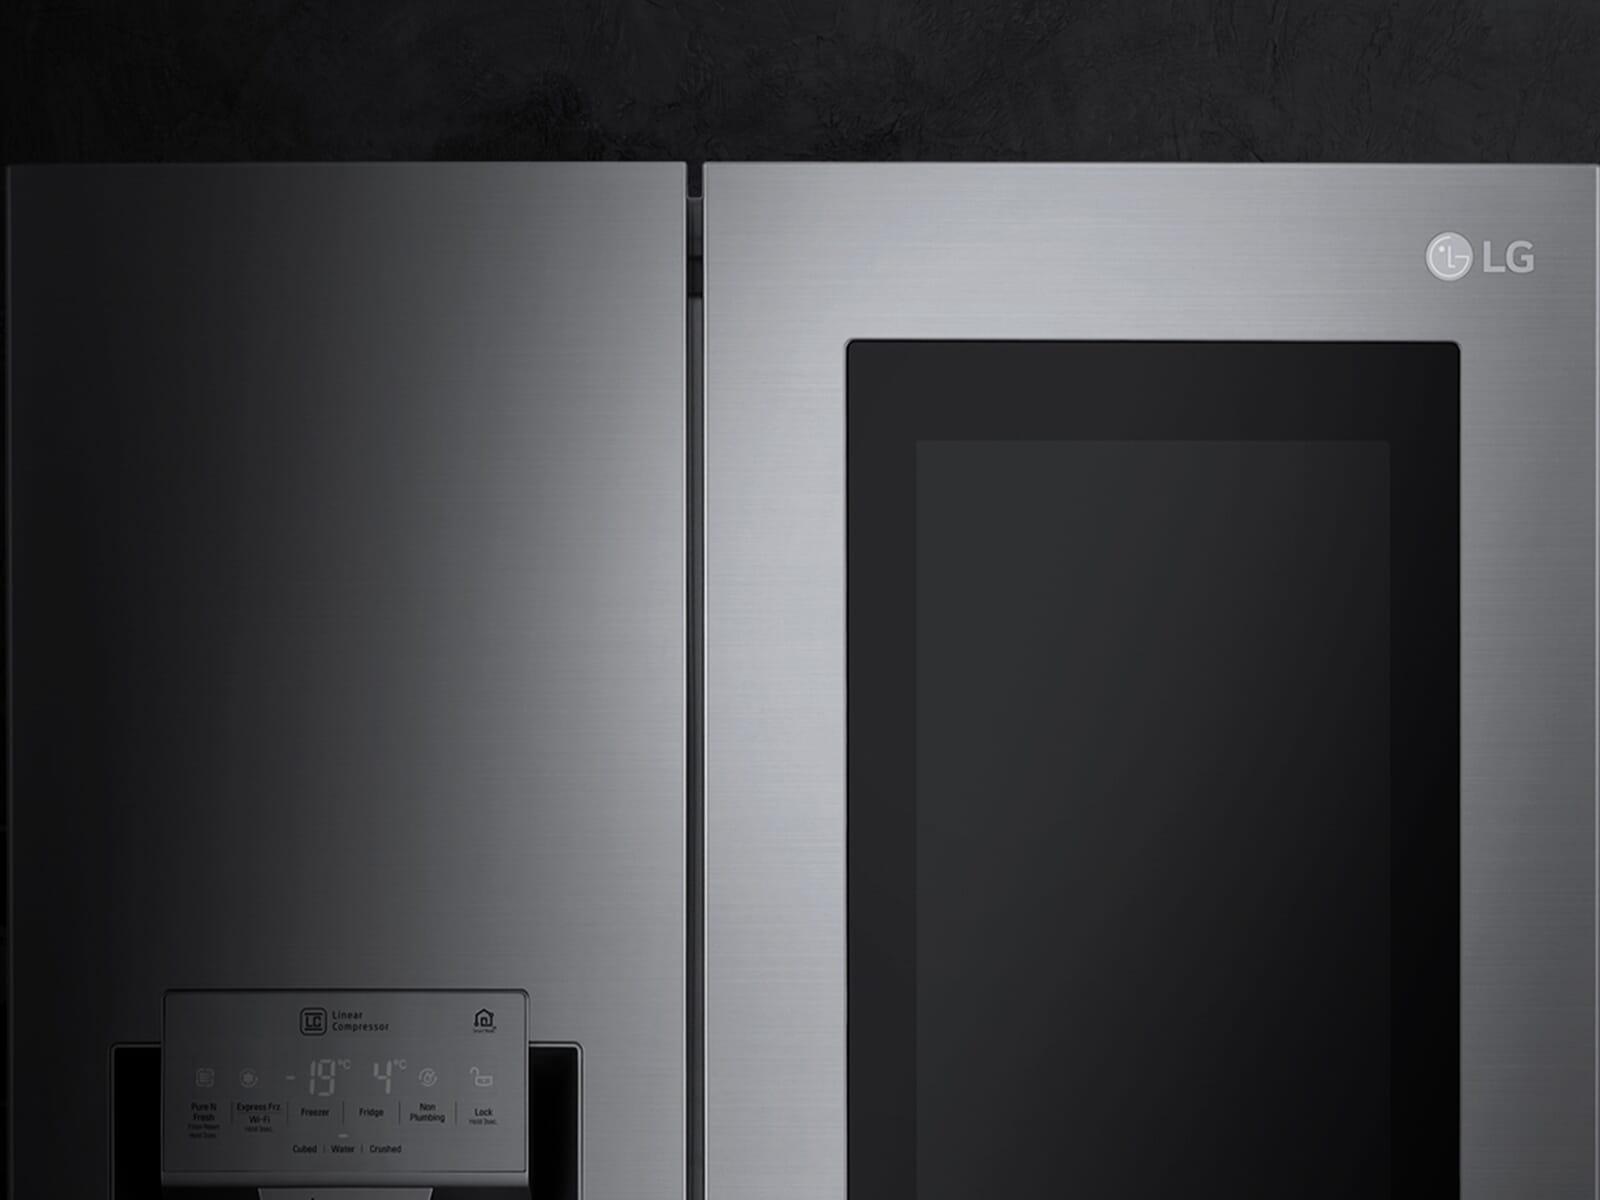 LG GSX 961 NEAZ Side by Side Kühl-Gefrier-Kombination Edelstahl